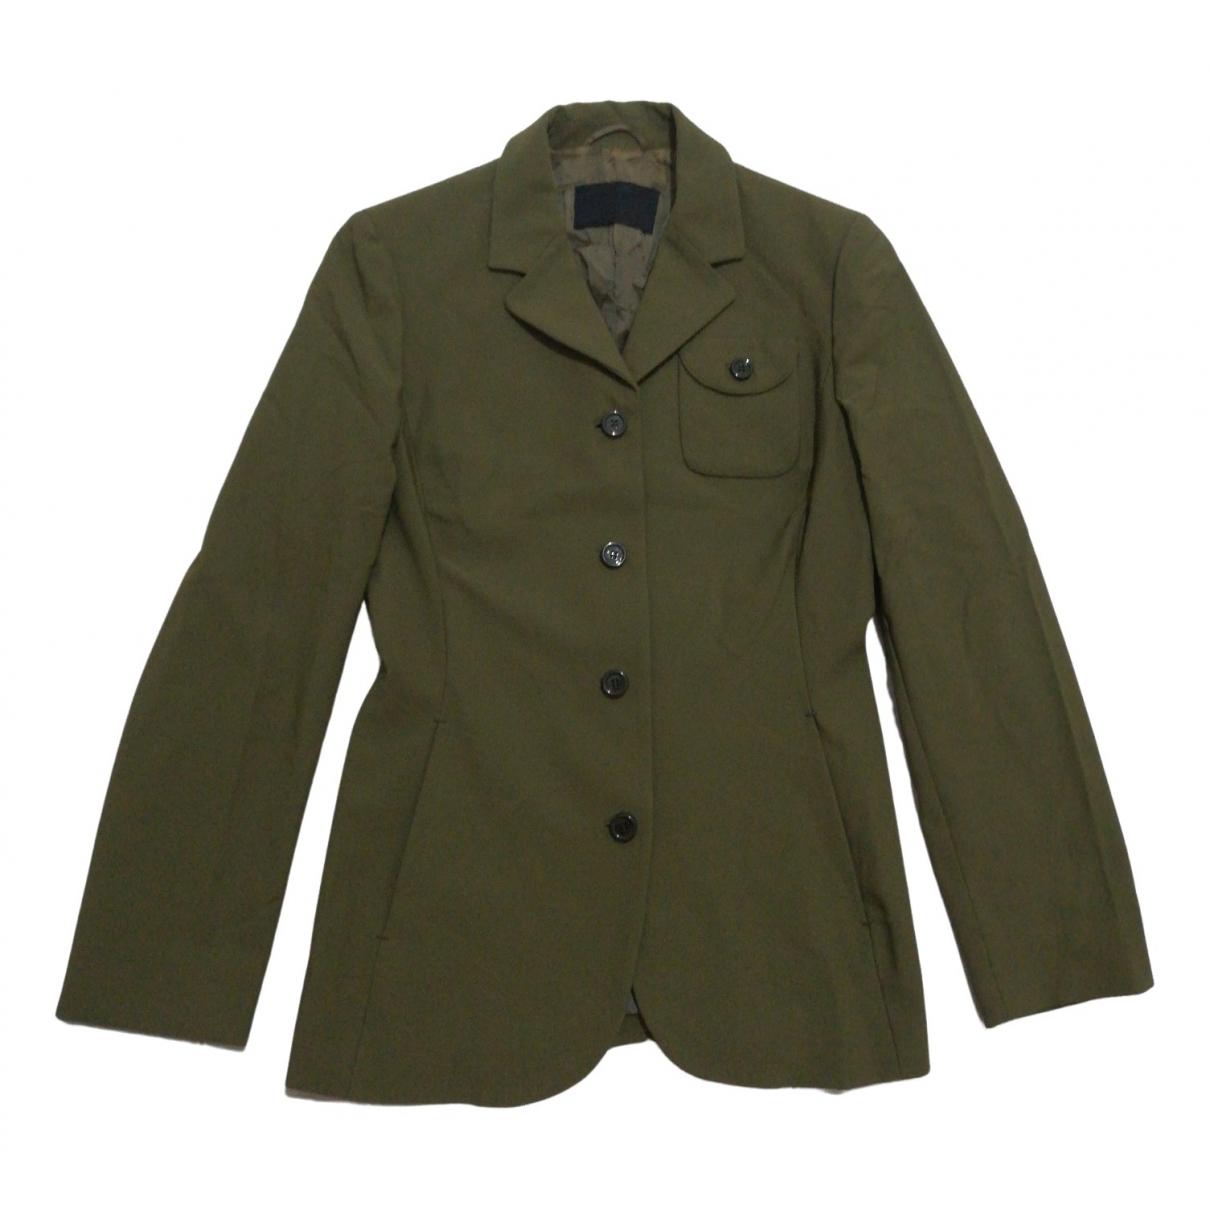 Prada \N Green jacket for Women 44 IT